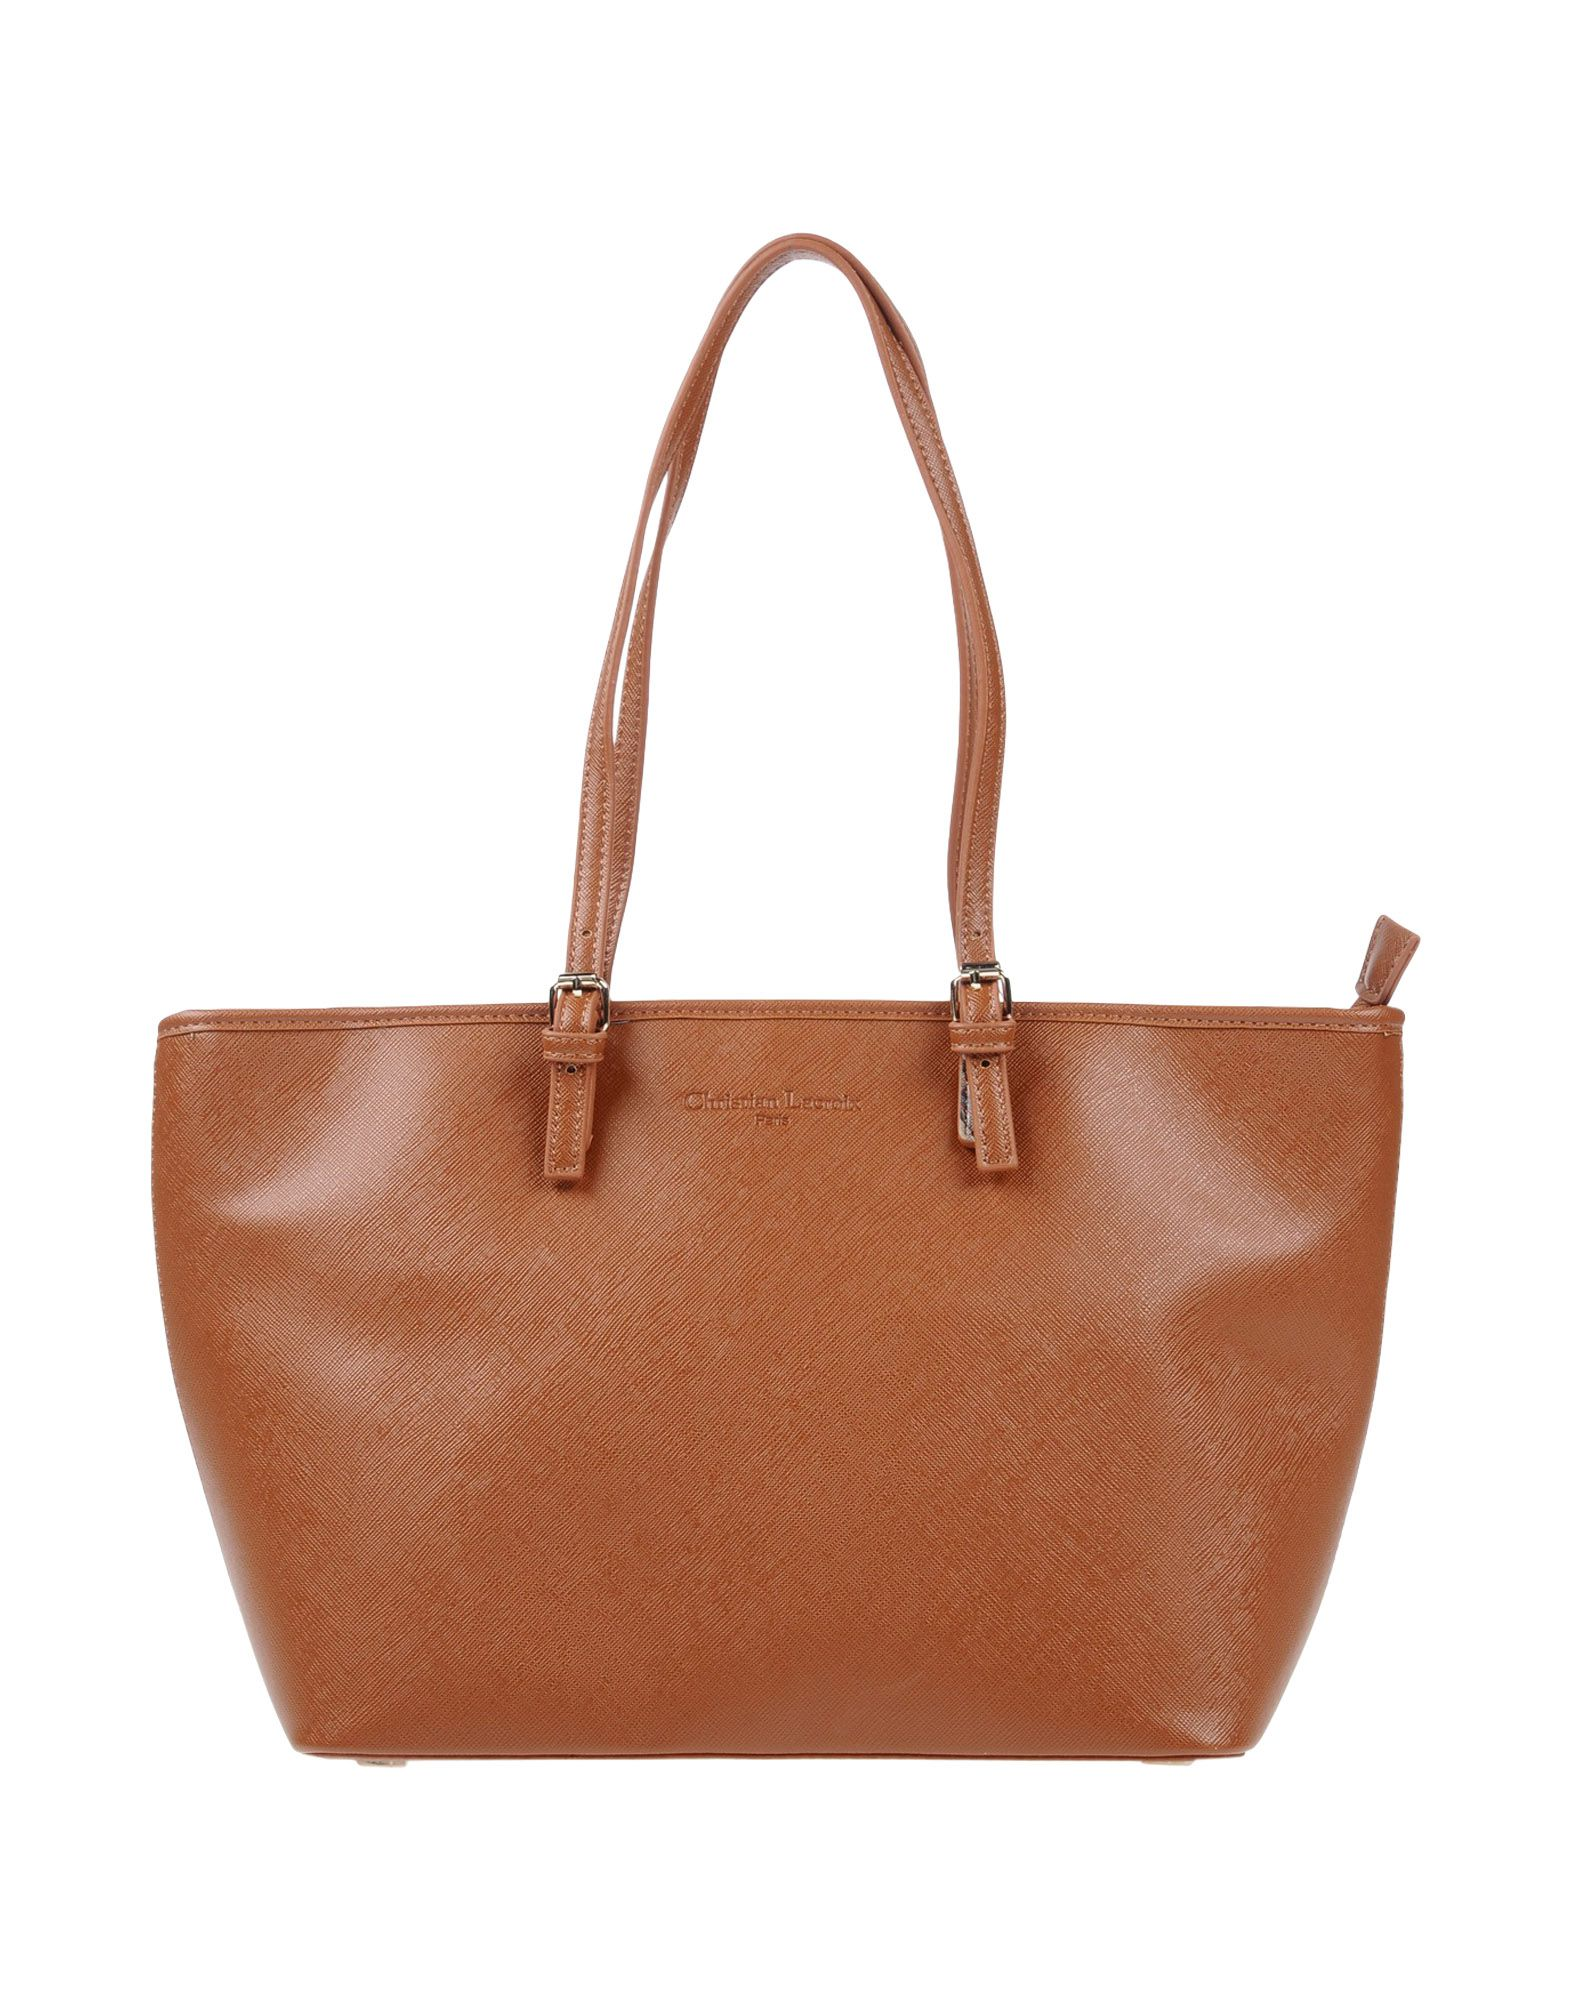 CHRISTIAN LACROIX Handbag in Brown